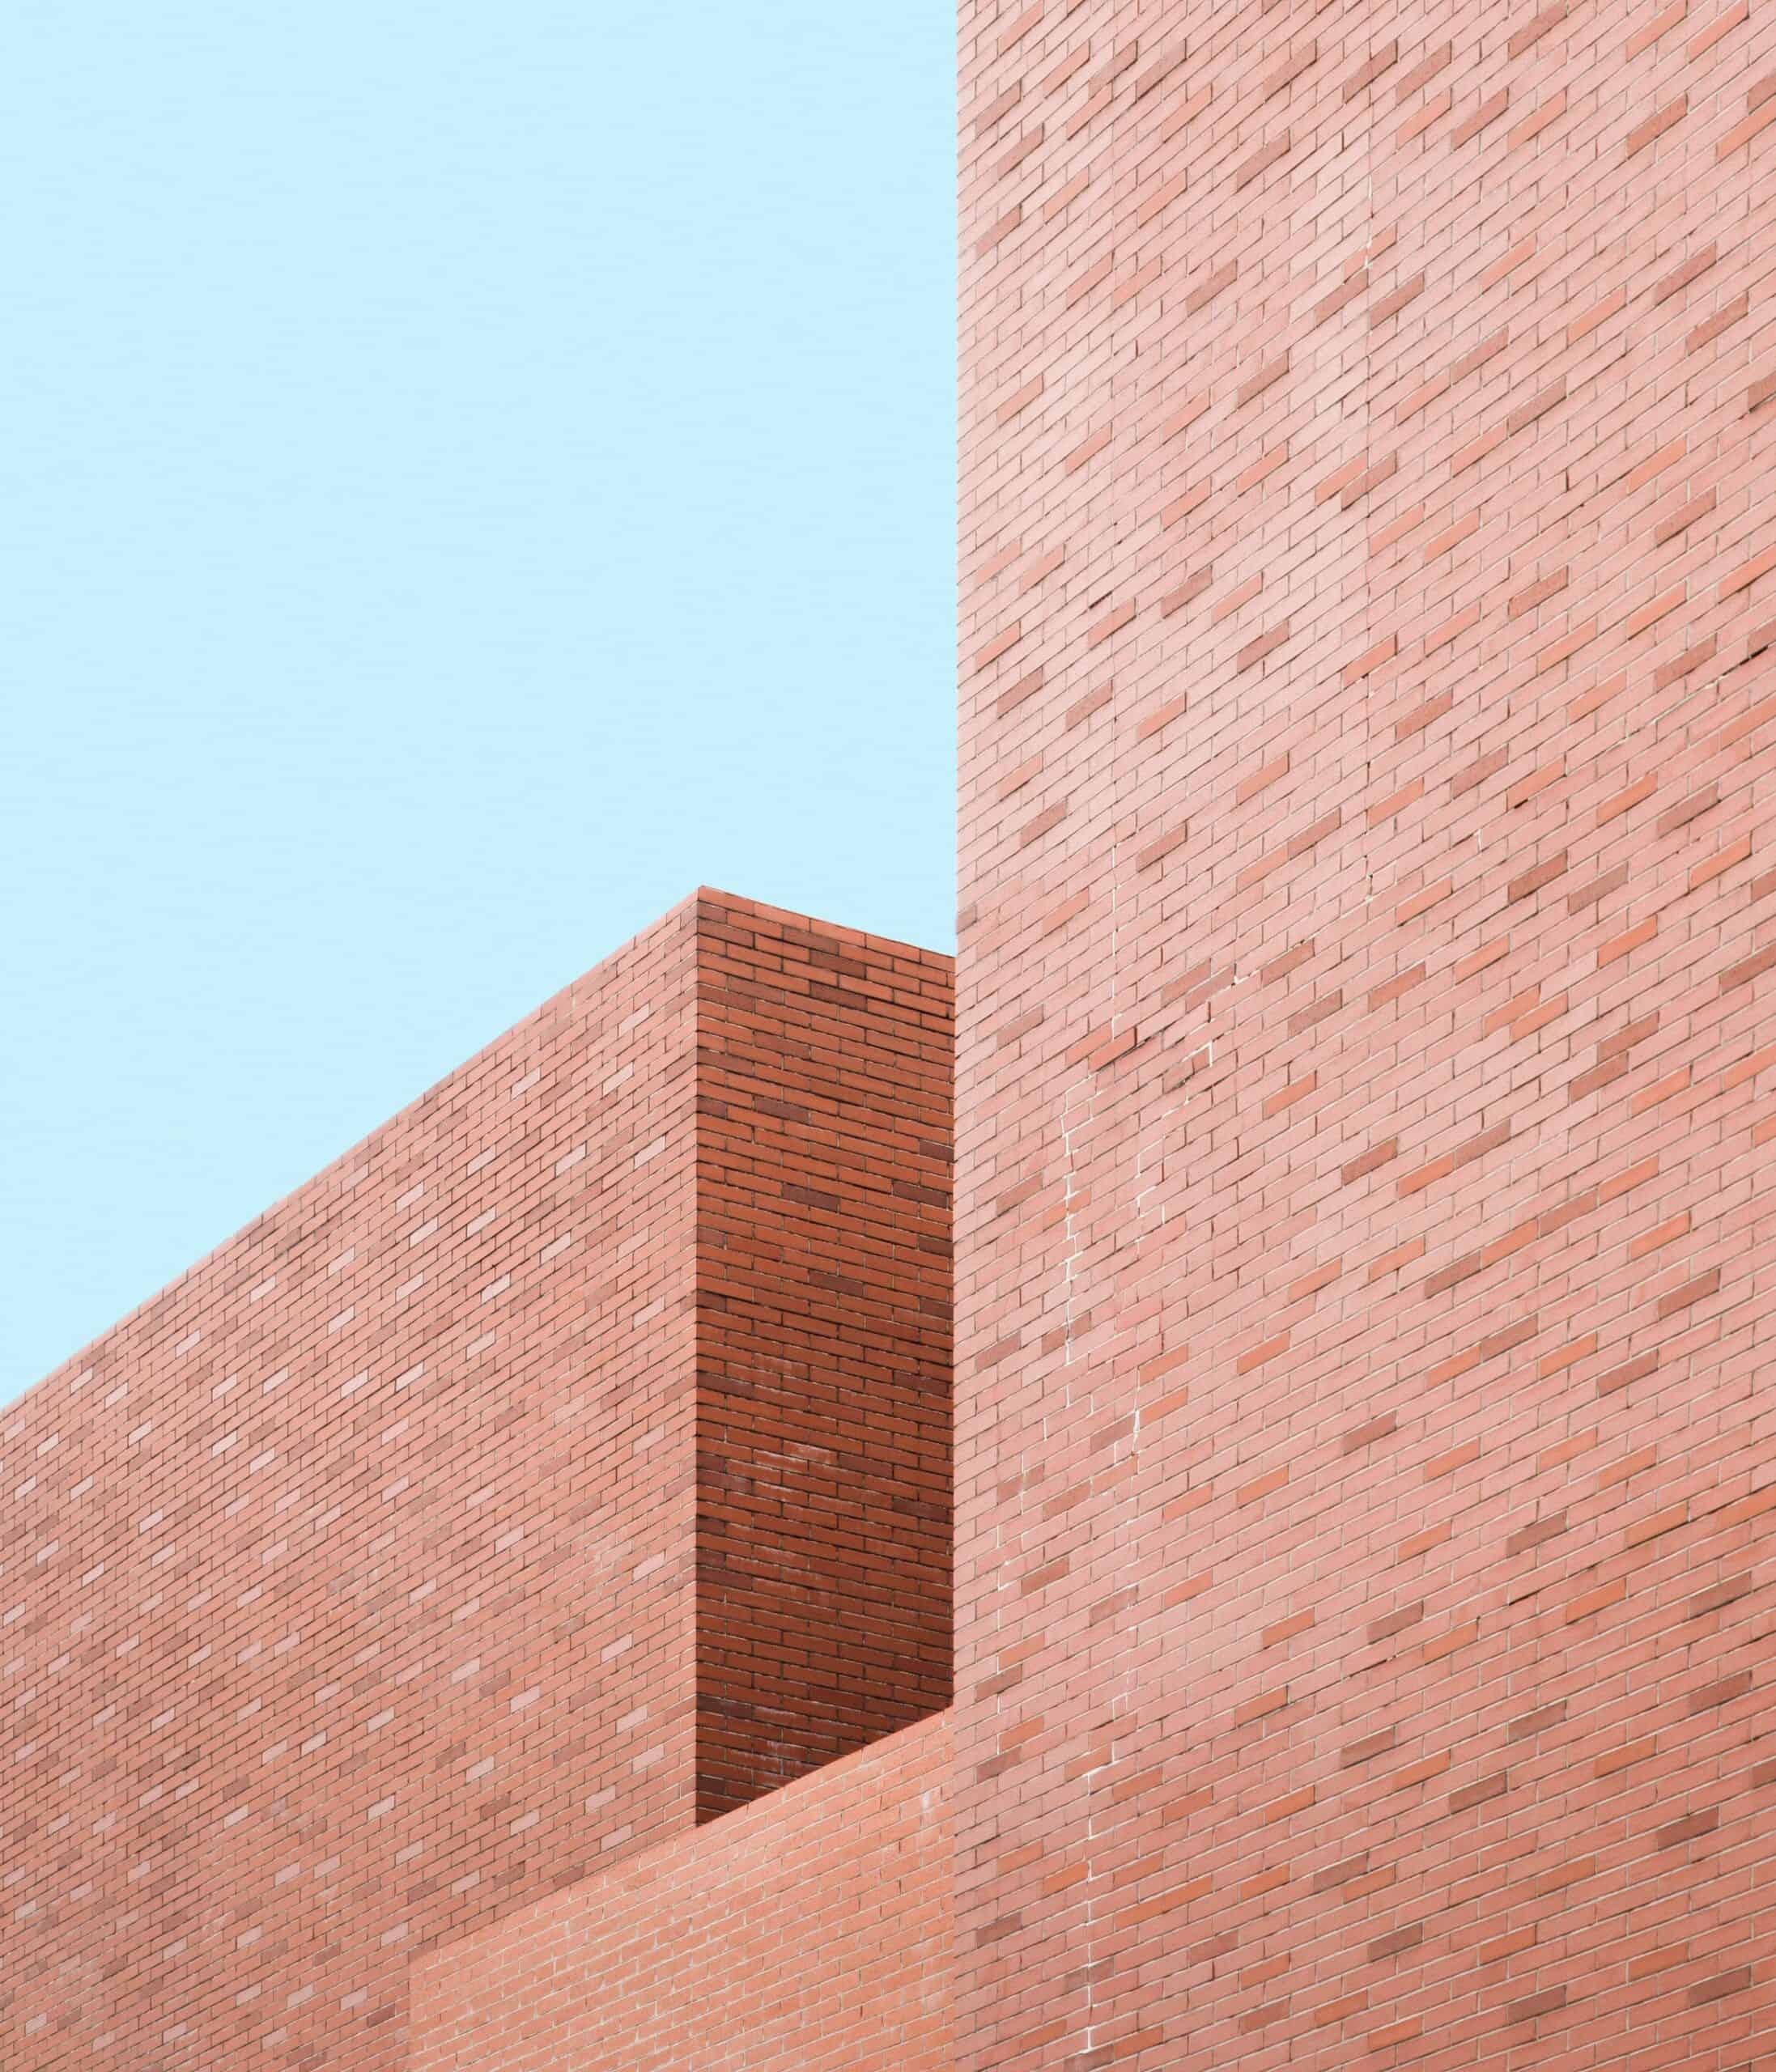 digital marketing for Brick suppliers